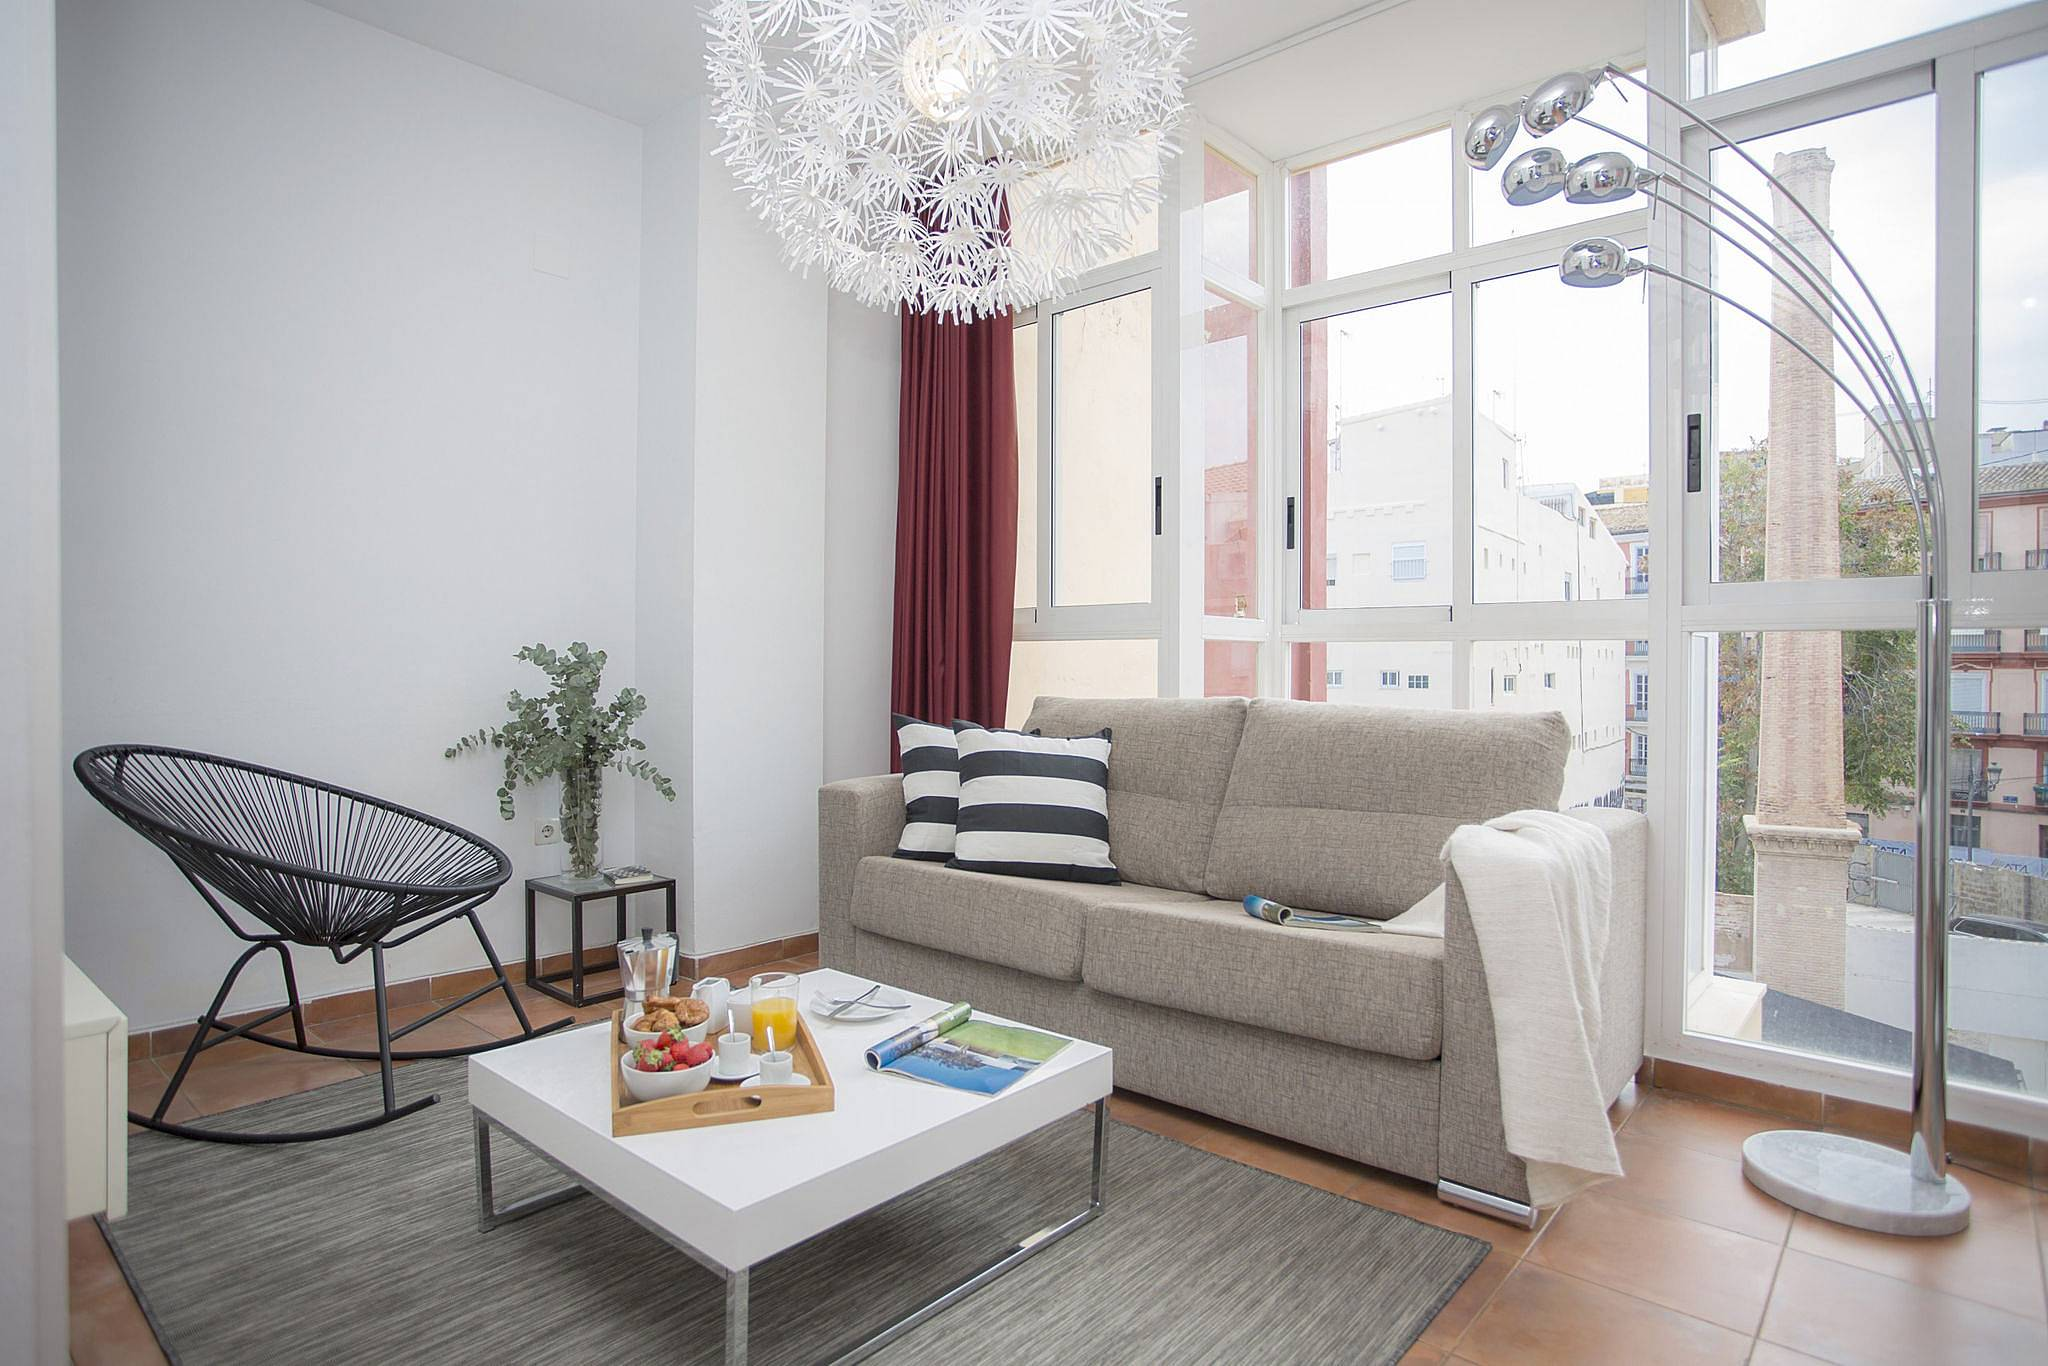 Apartamento en alquiler en valencia centro barrio de la luz xirivella valencia - Apartamento valencia alquiler ...